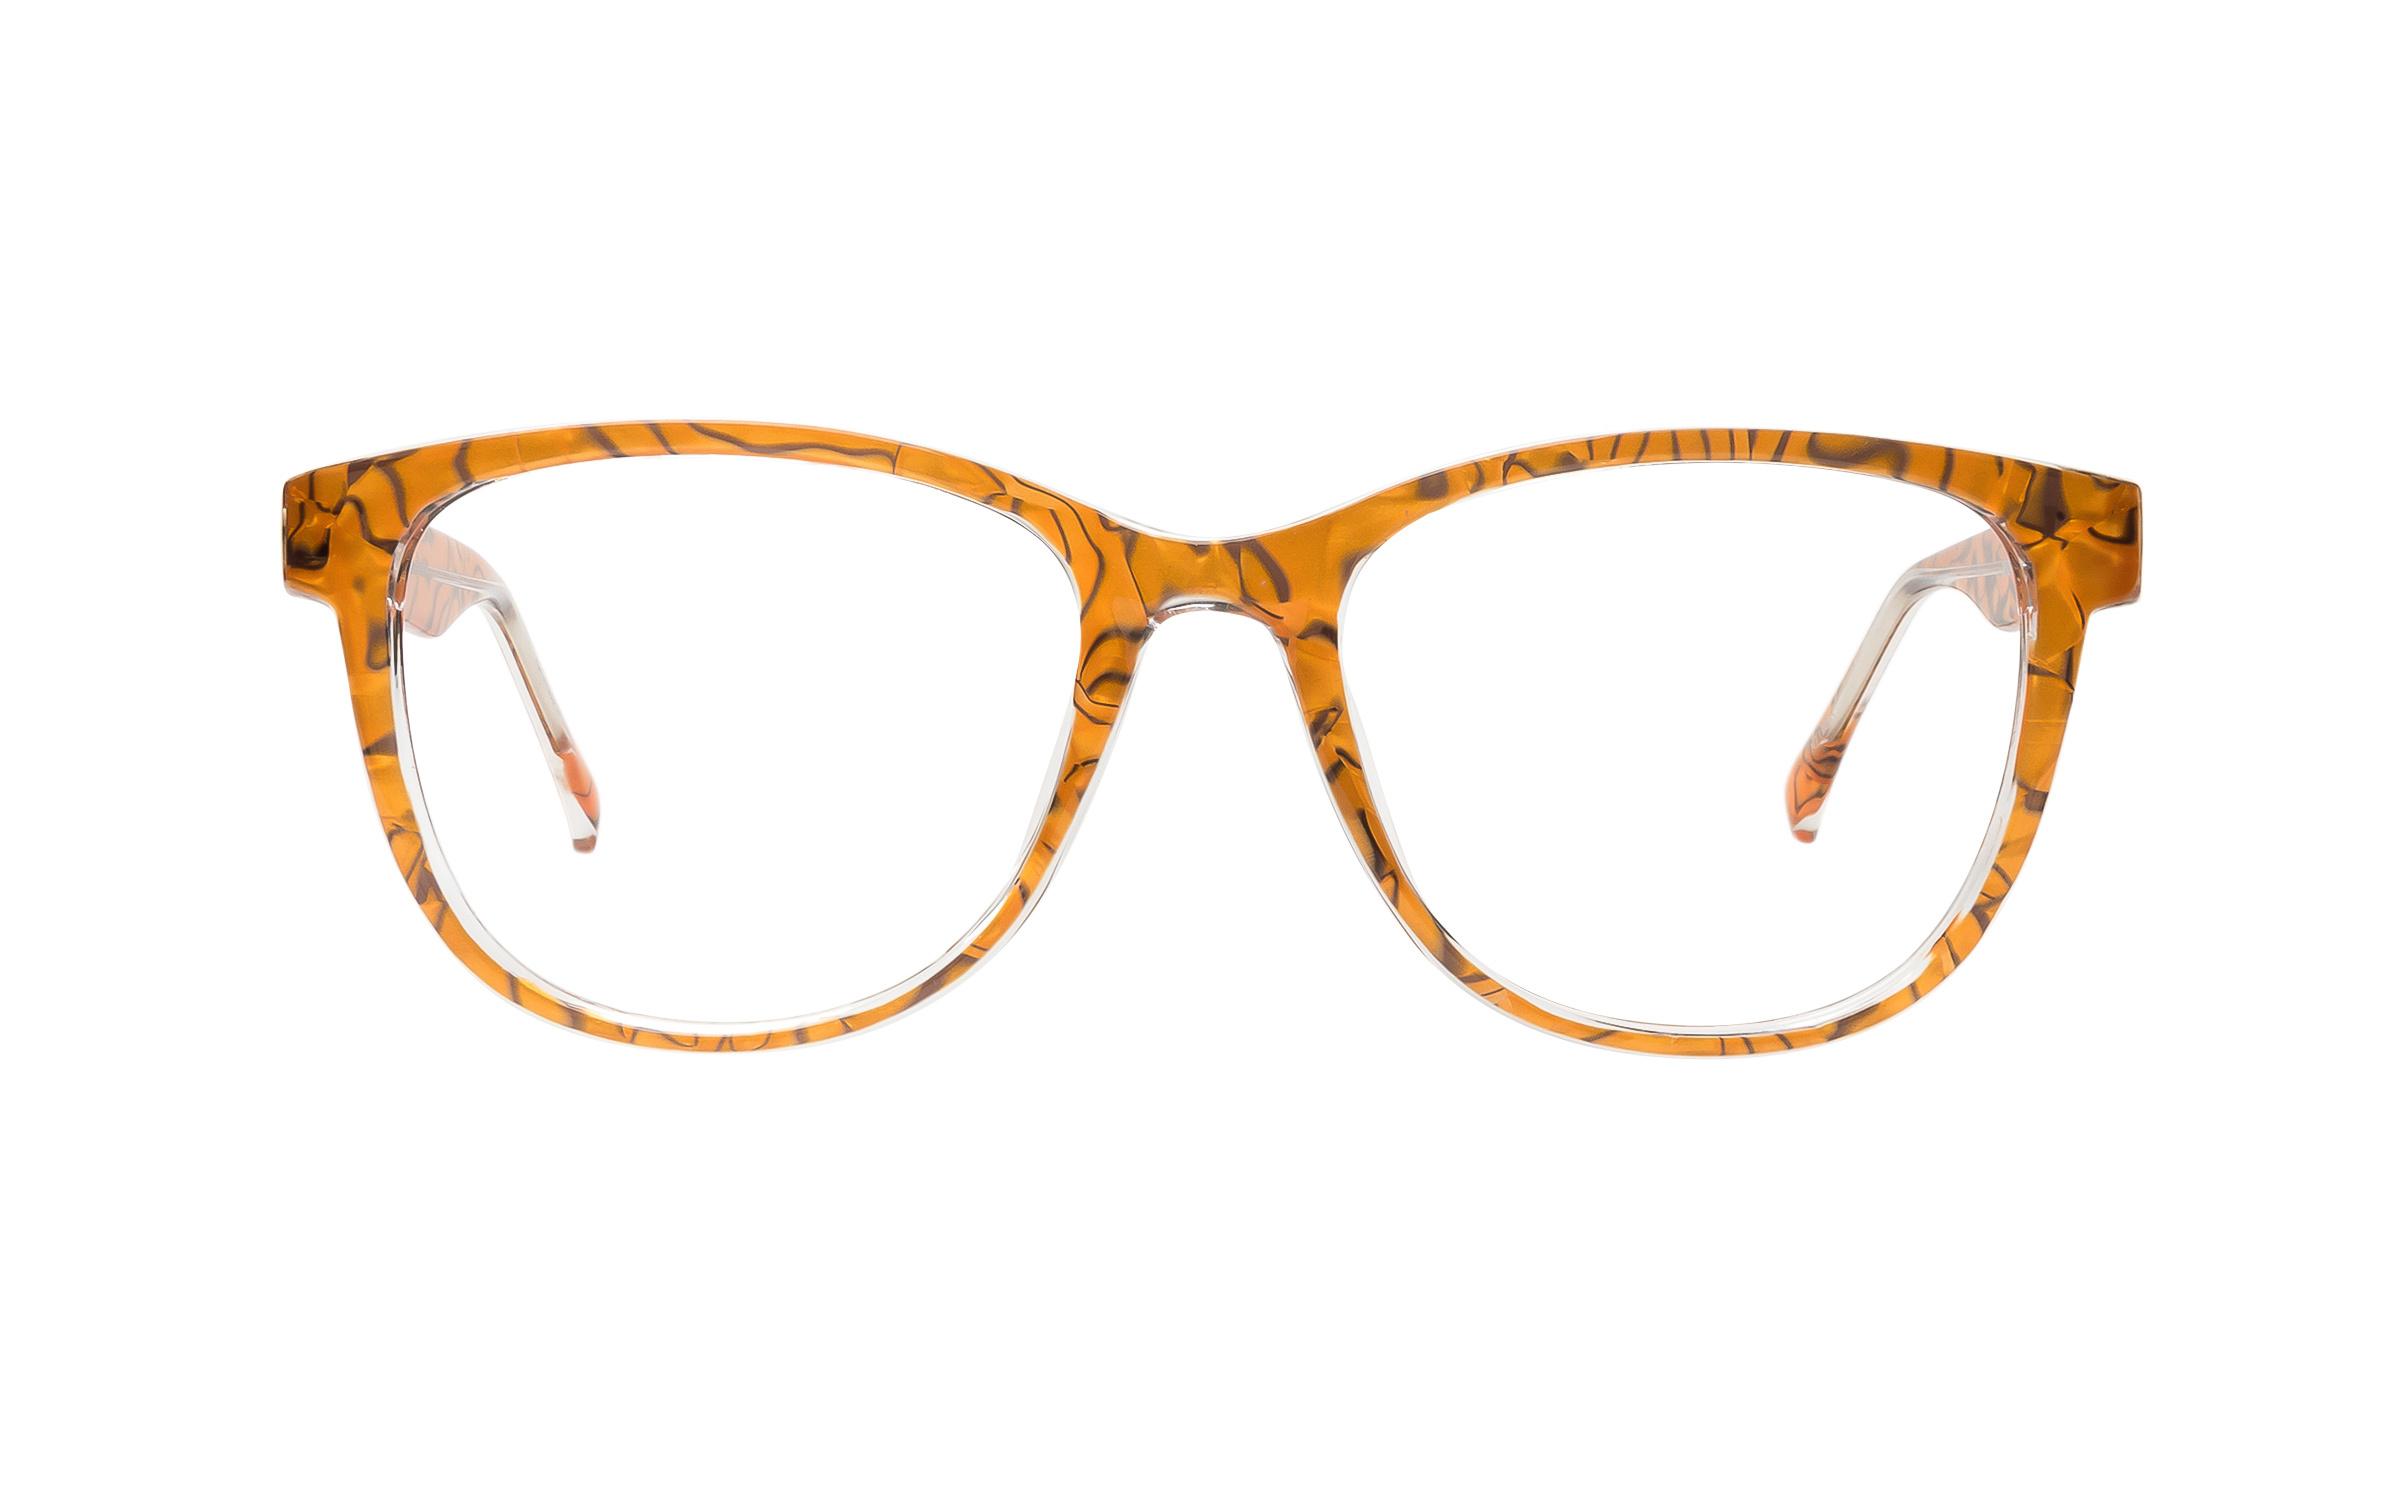 Clearly Basics Cormorant 3004 C2 (54) Eyeglasses and Frame in Tigers Eye Orange/Black | Plastic